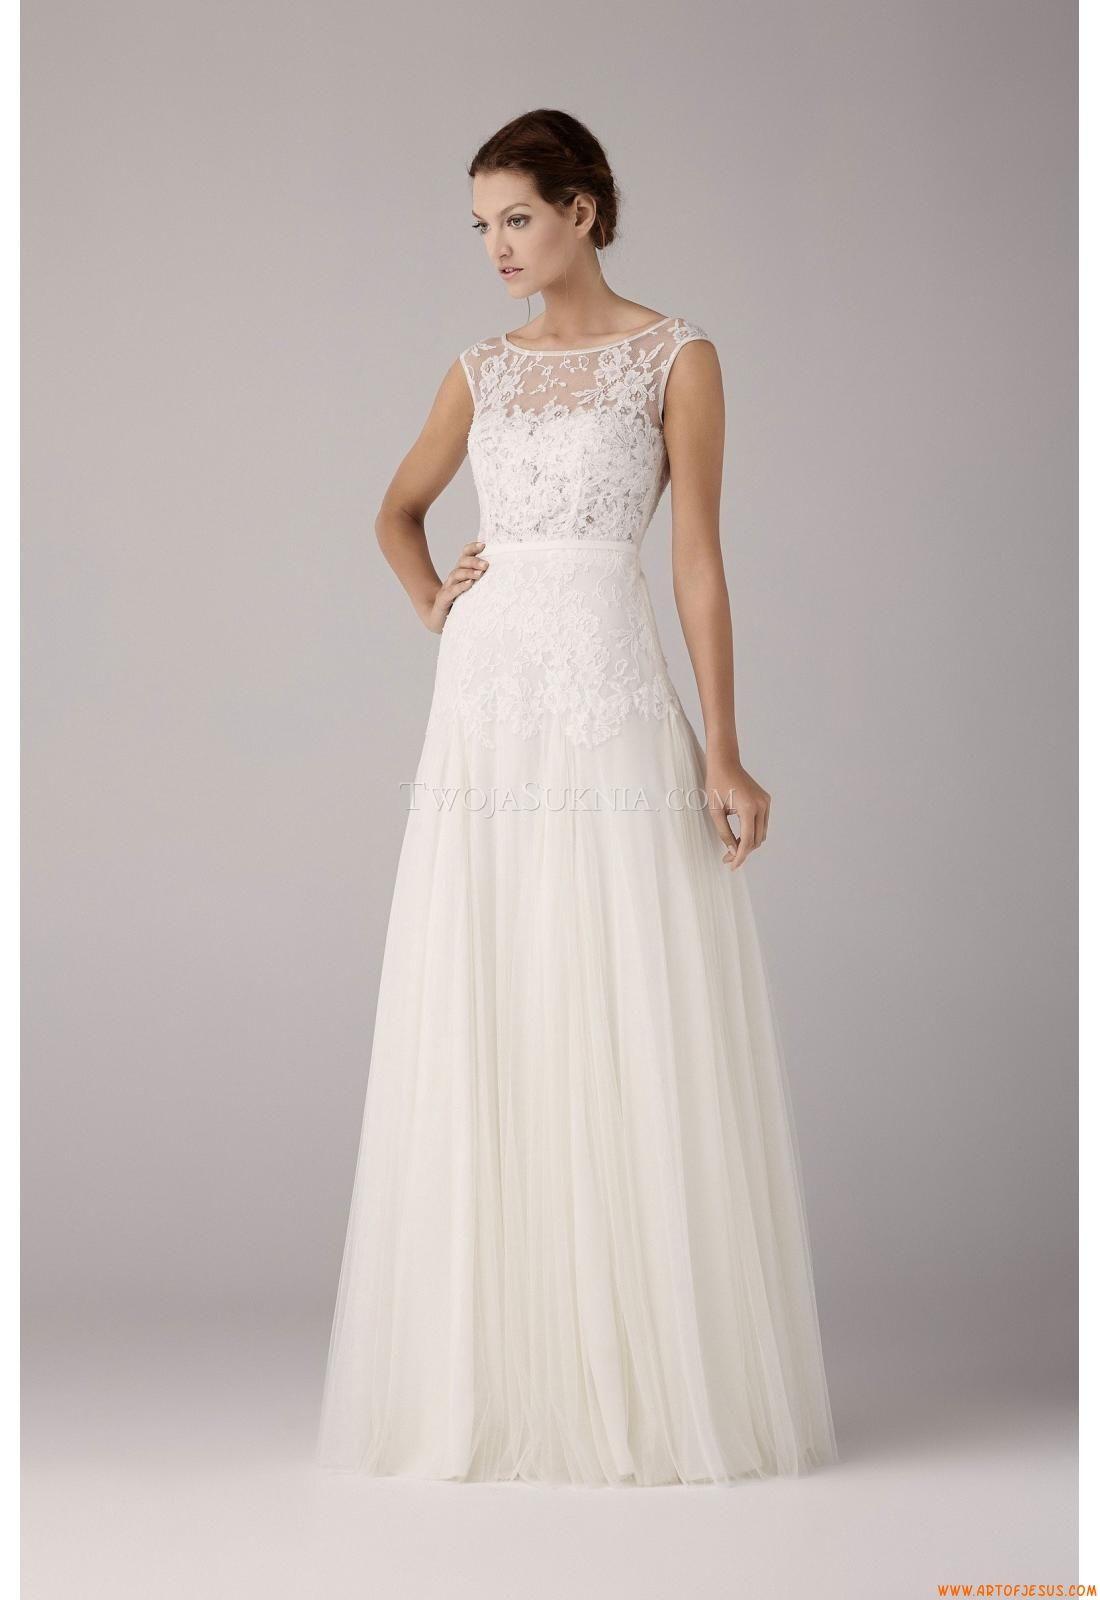 b490eba194 A-Miarka tiul prosta linia mody ślubnej sukni +2014 Internecie ...